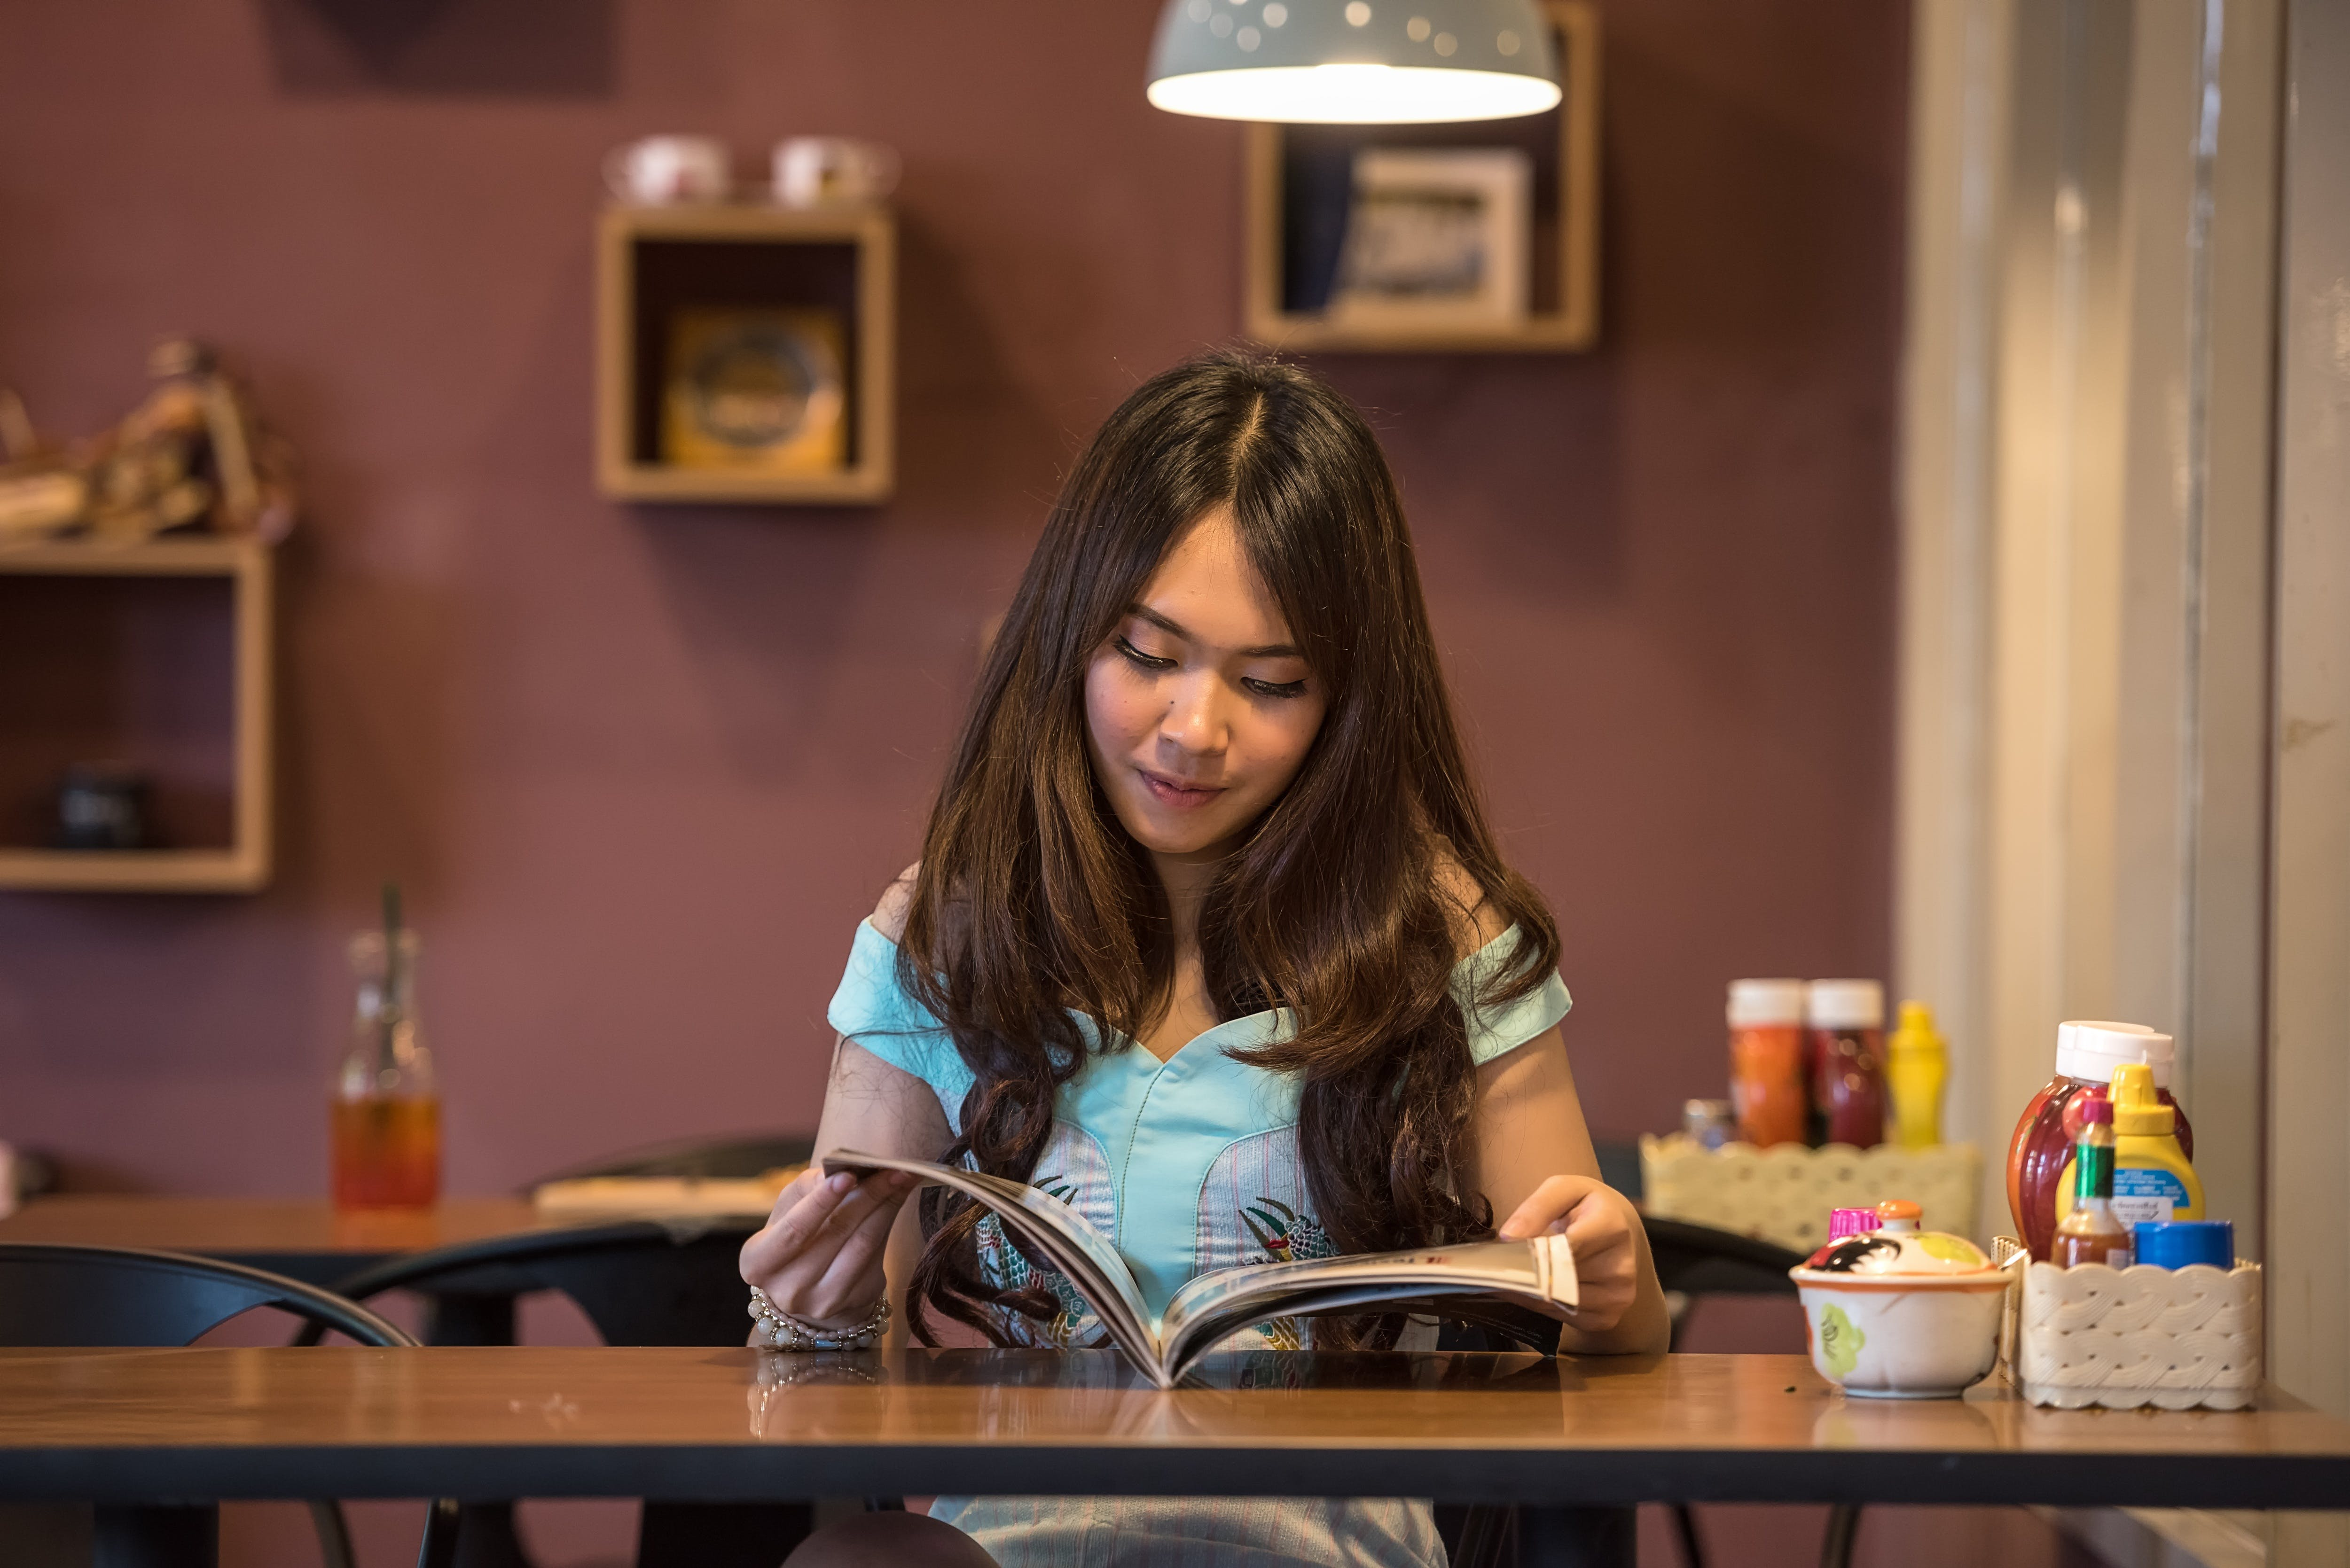 book, desk, girl